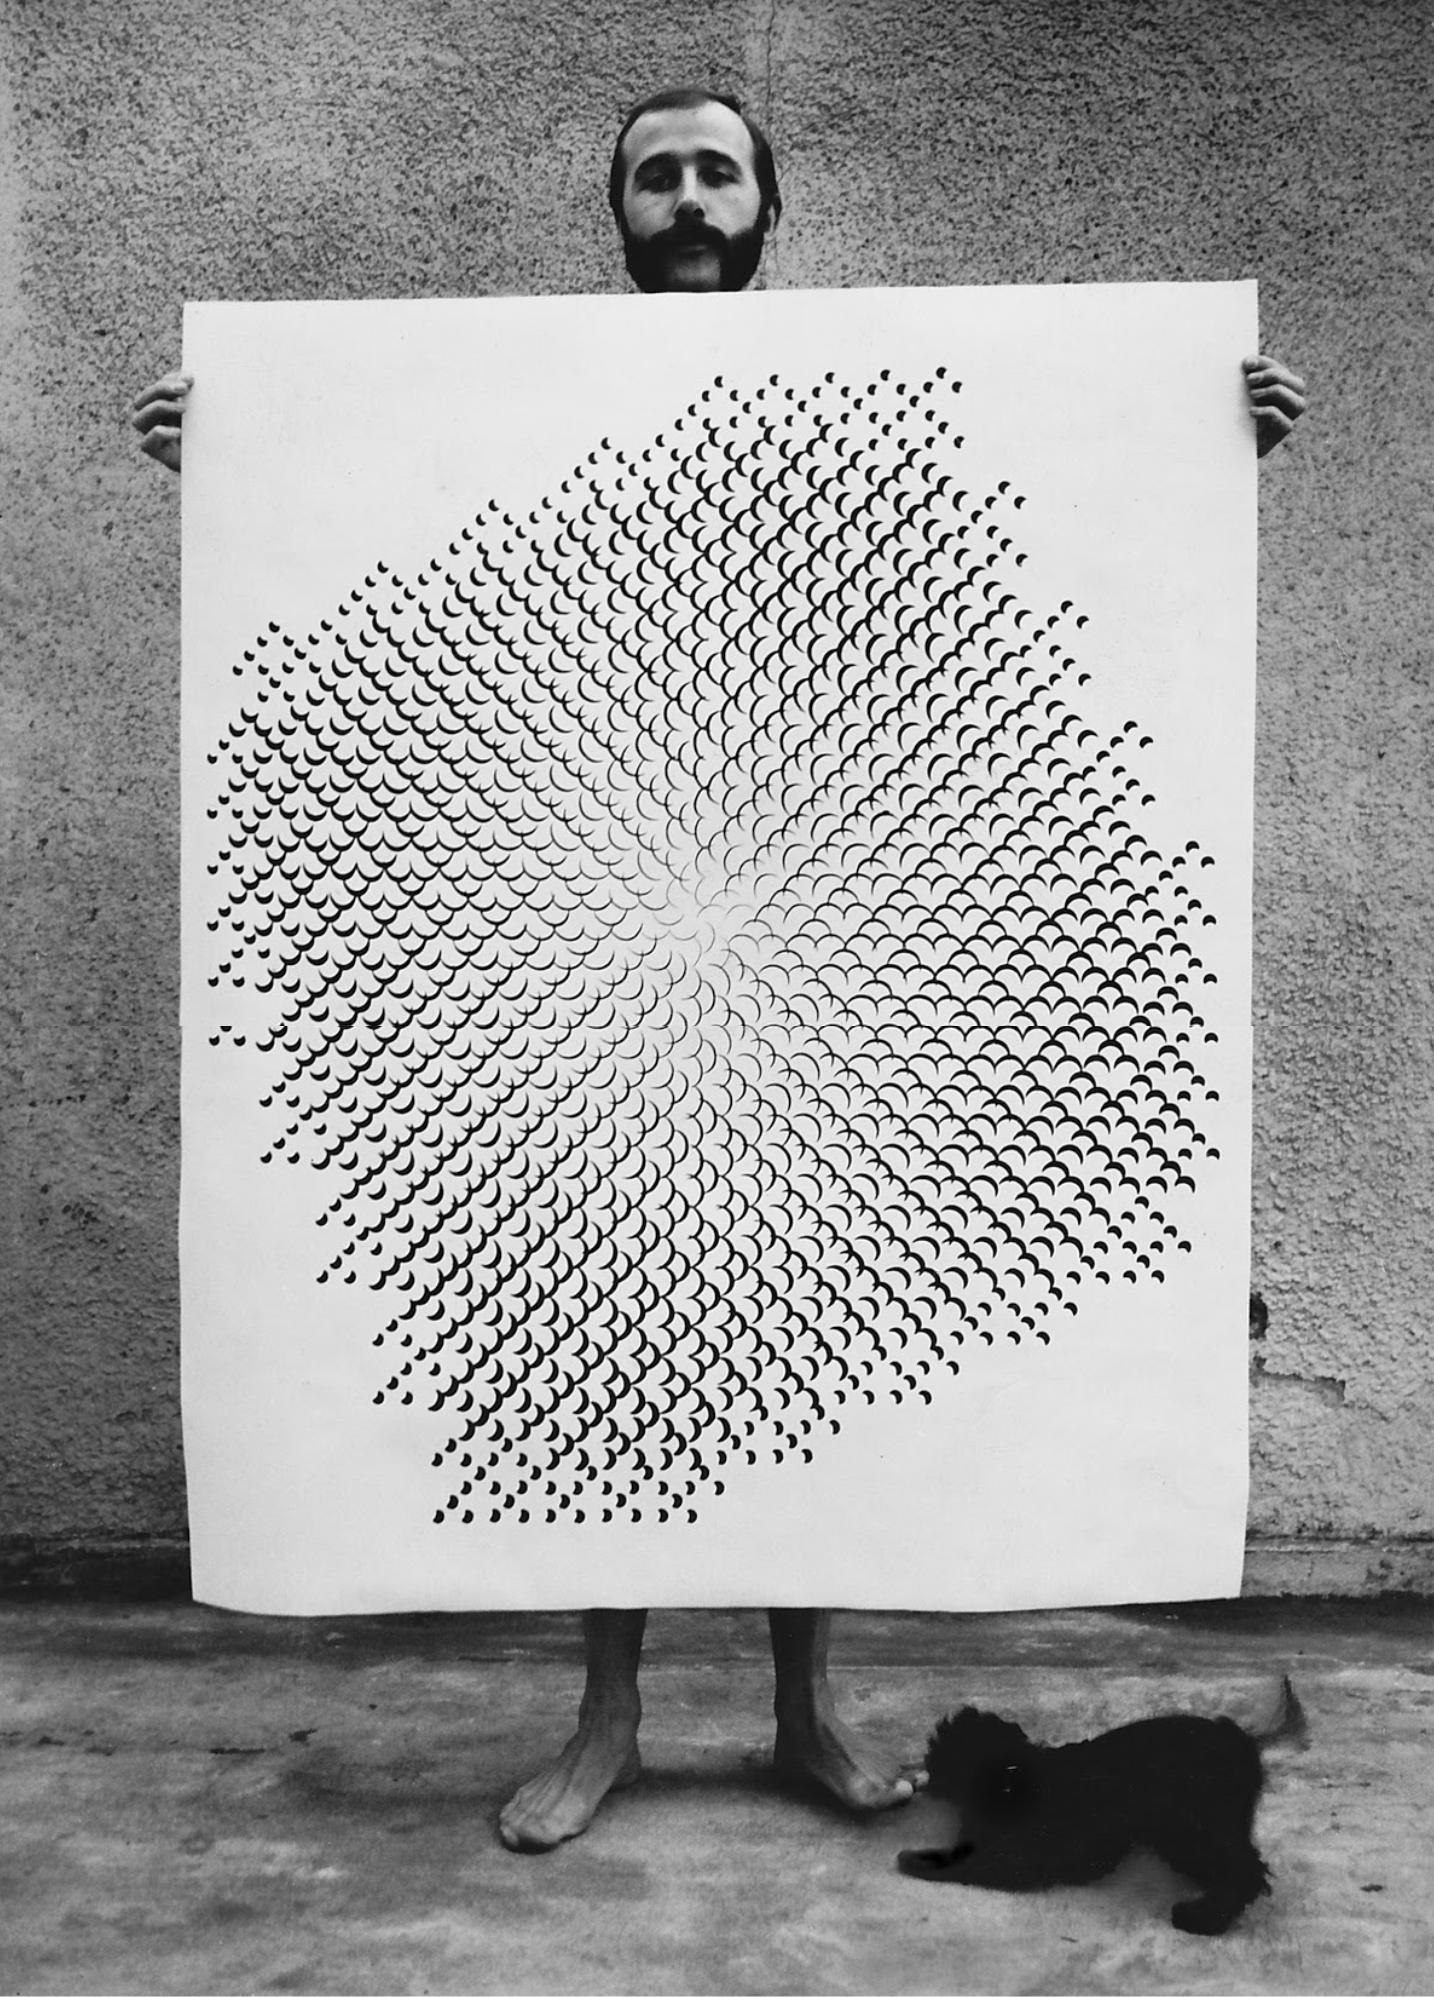 Gottfried Jäger presents his pinhole structure 3.8.14 F 2.6, 1967, b/w camera - photograph by Ursel Jäger